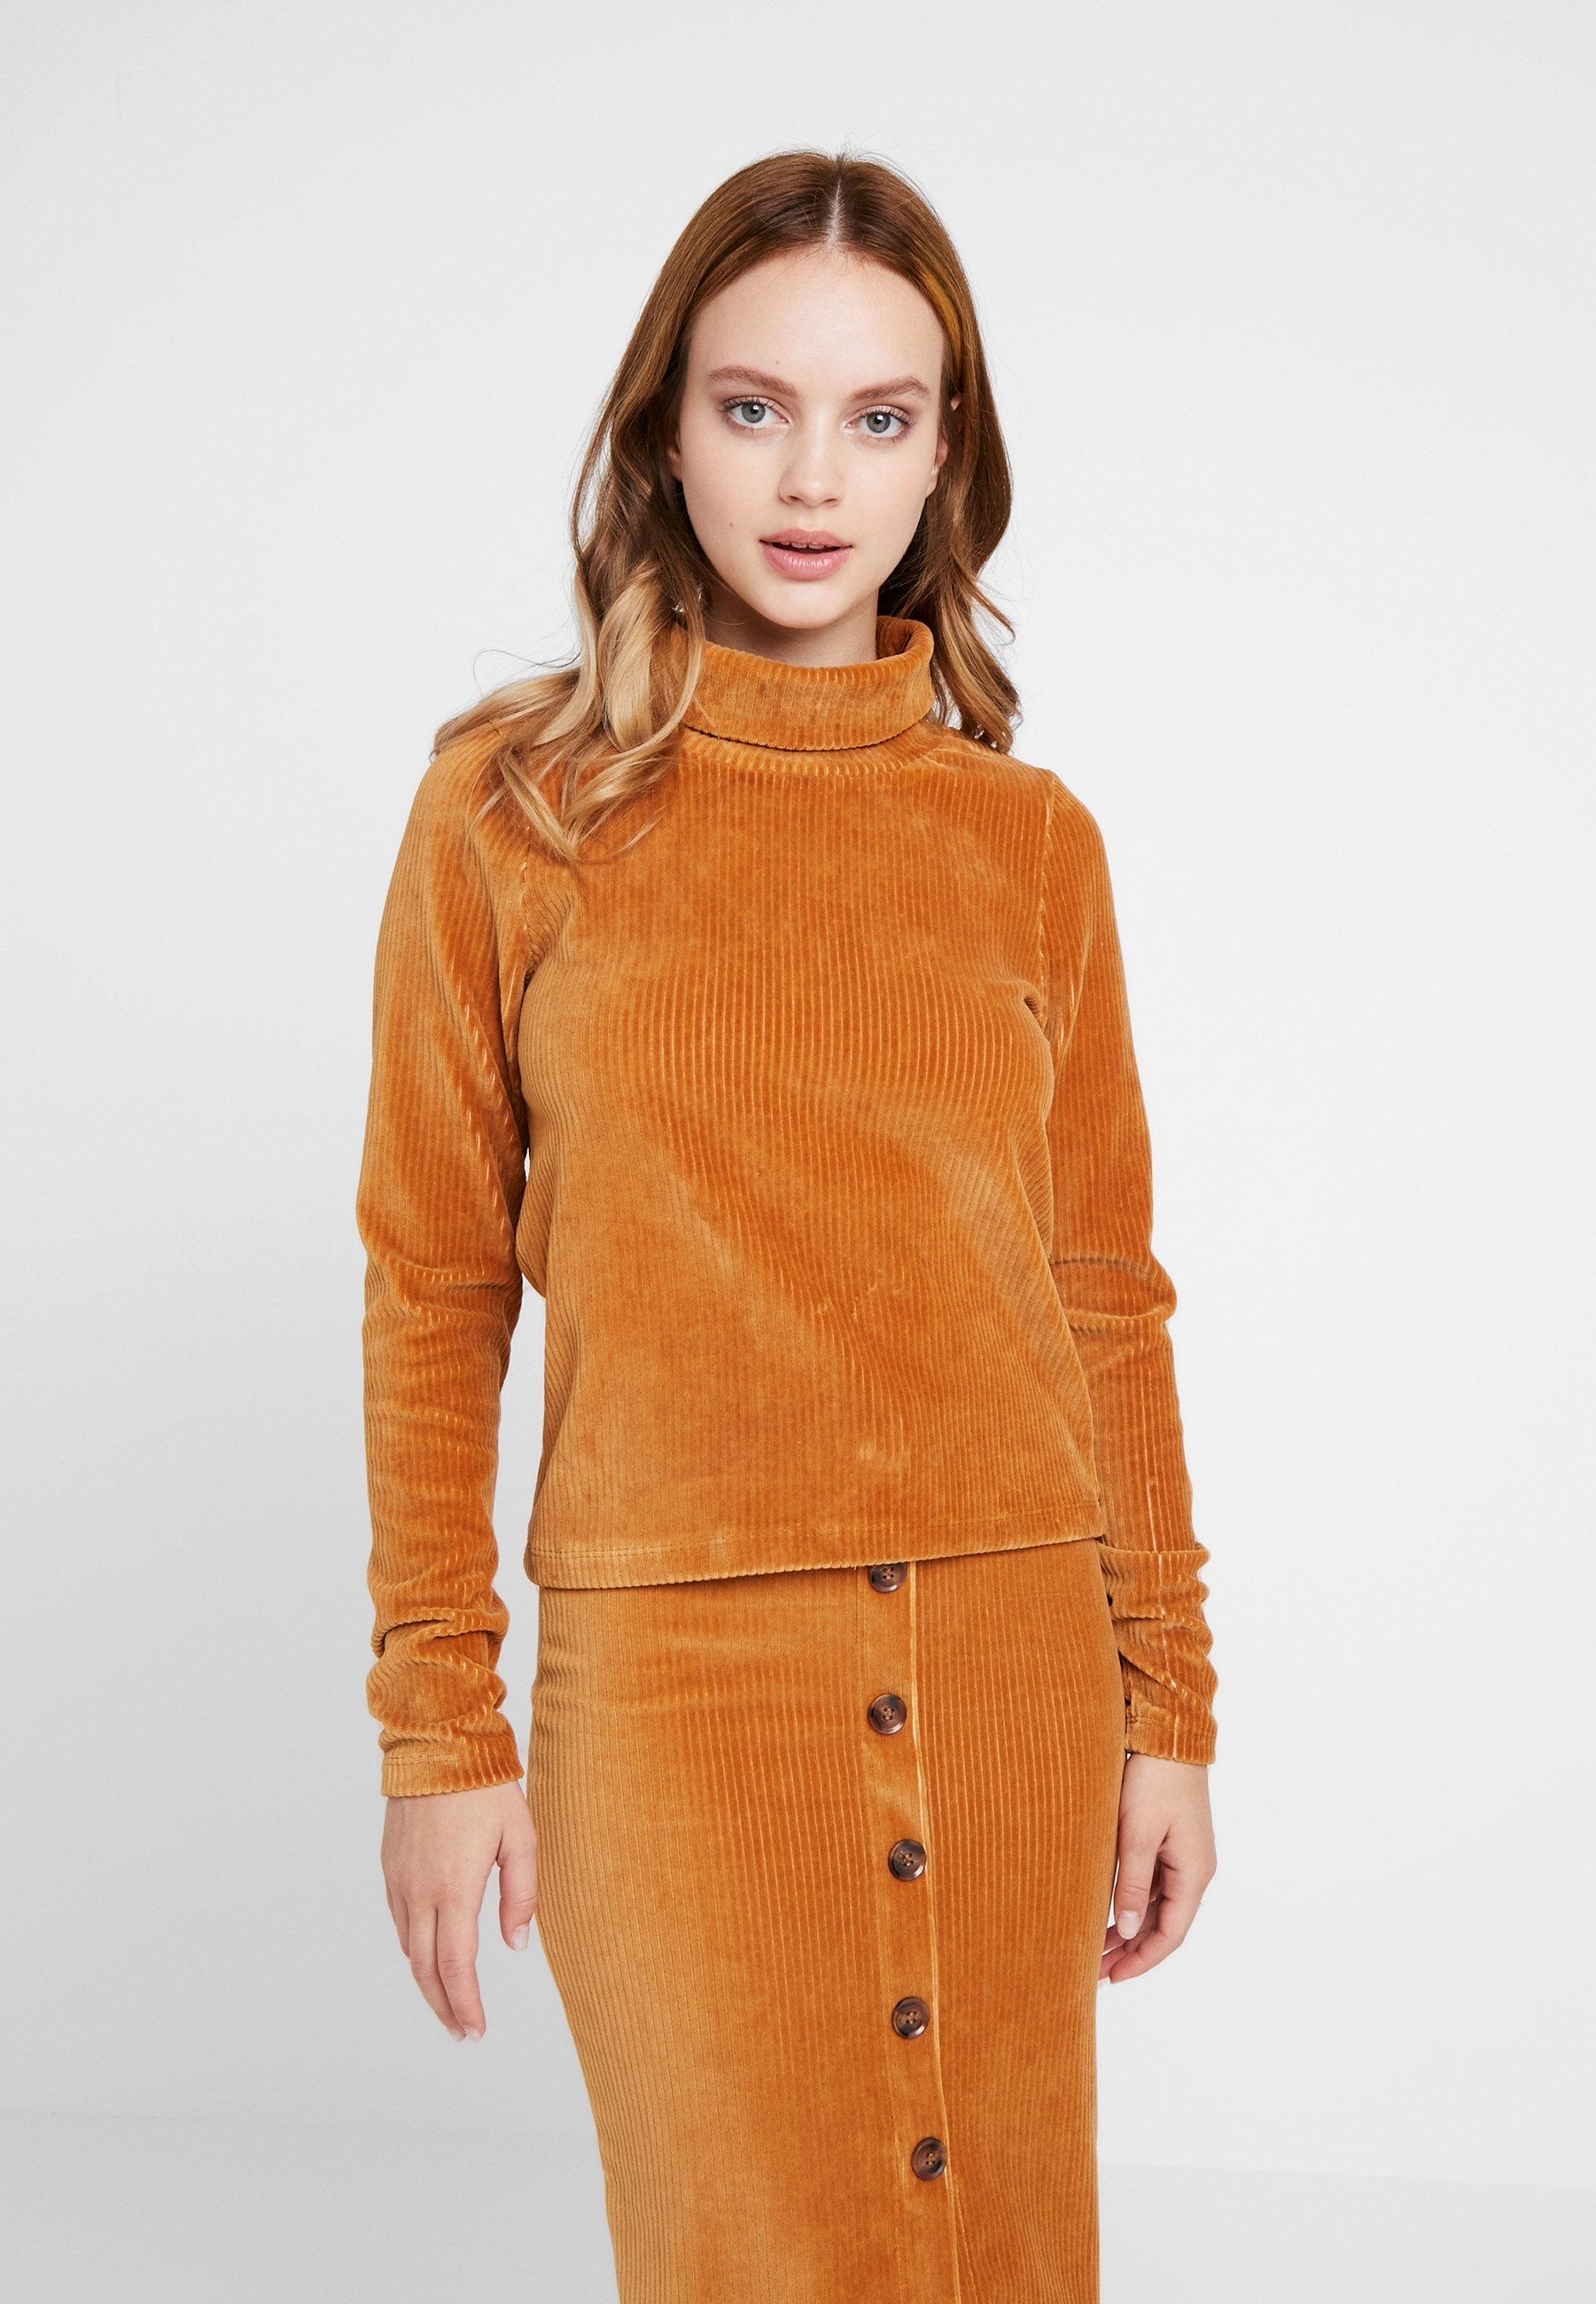 shirt Object Sugar Brown Manches Objcorda RollneckT Longues À Petite L4A3j5R